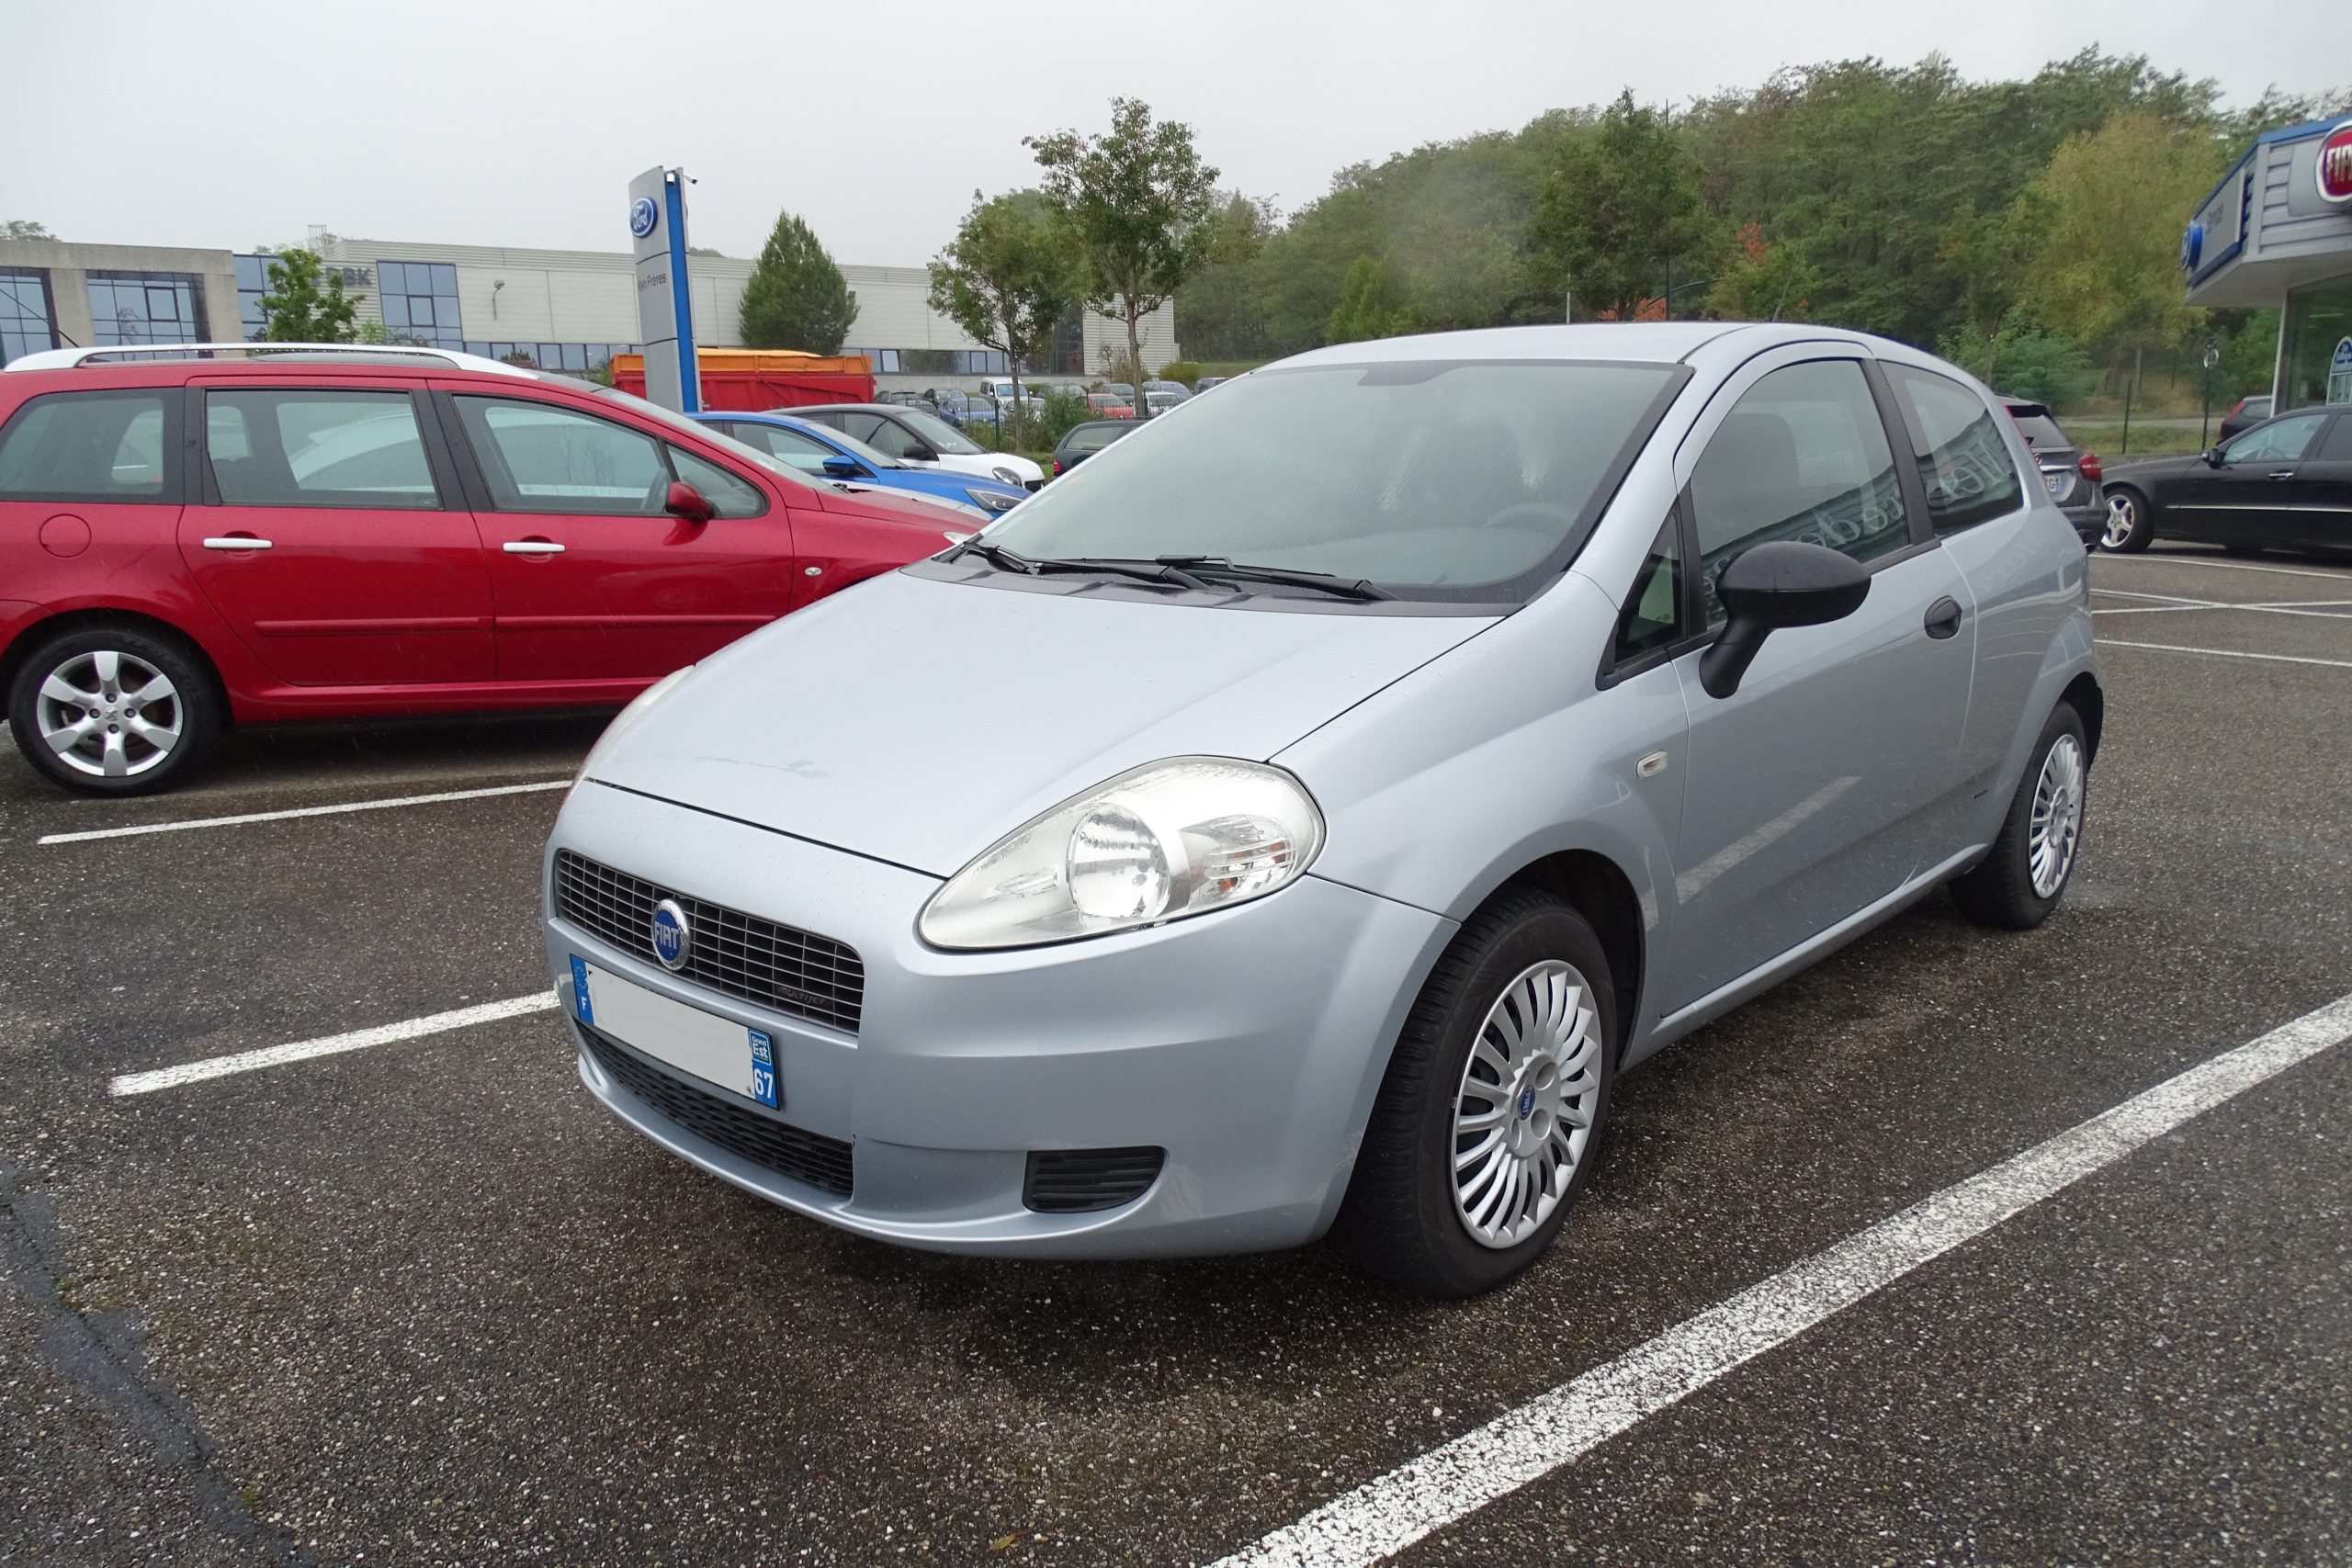 Fiat Punto 1.3 Mjt 75ch CULT